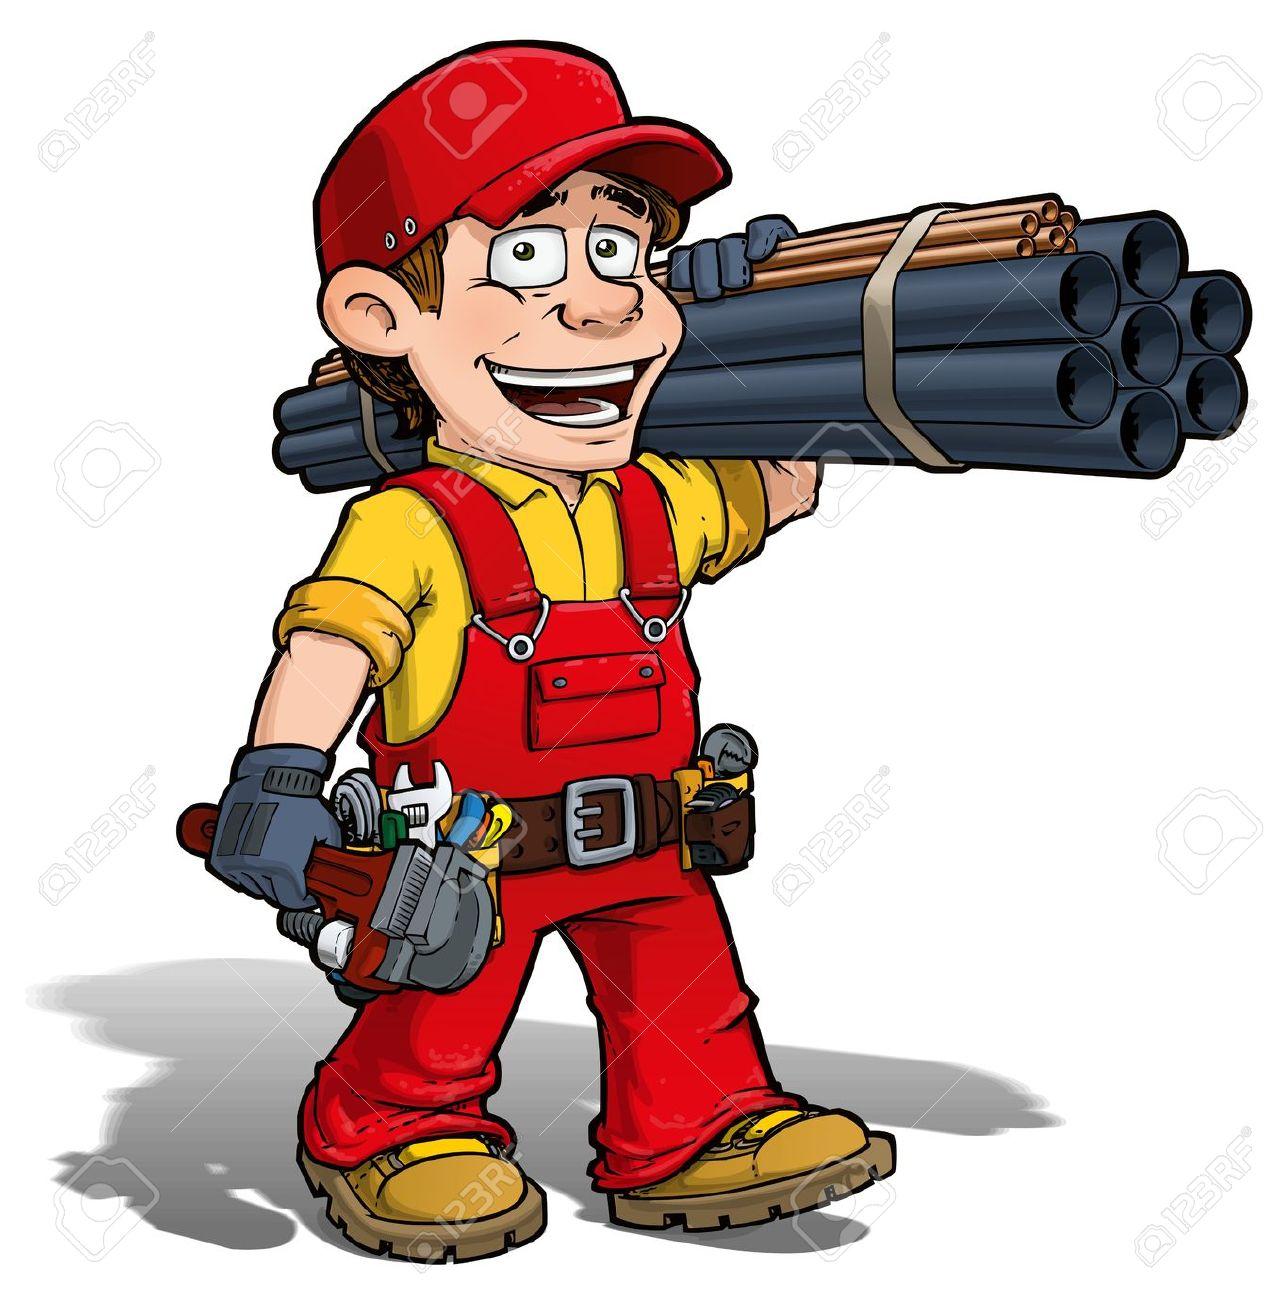 Plumbing cartoon clipart vector black and white stock Plumbing cartoon clipart - ClipartFest vector black and white stock